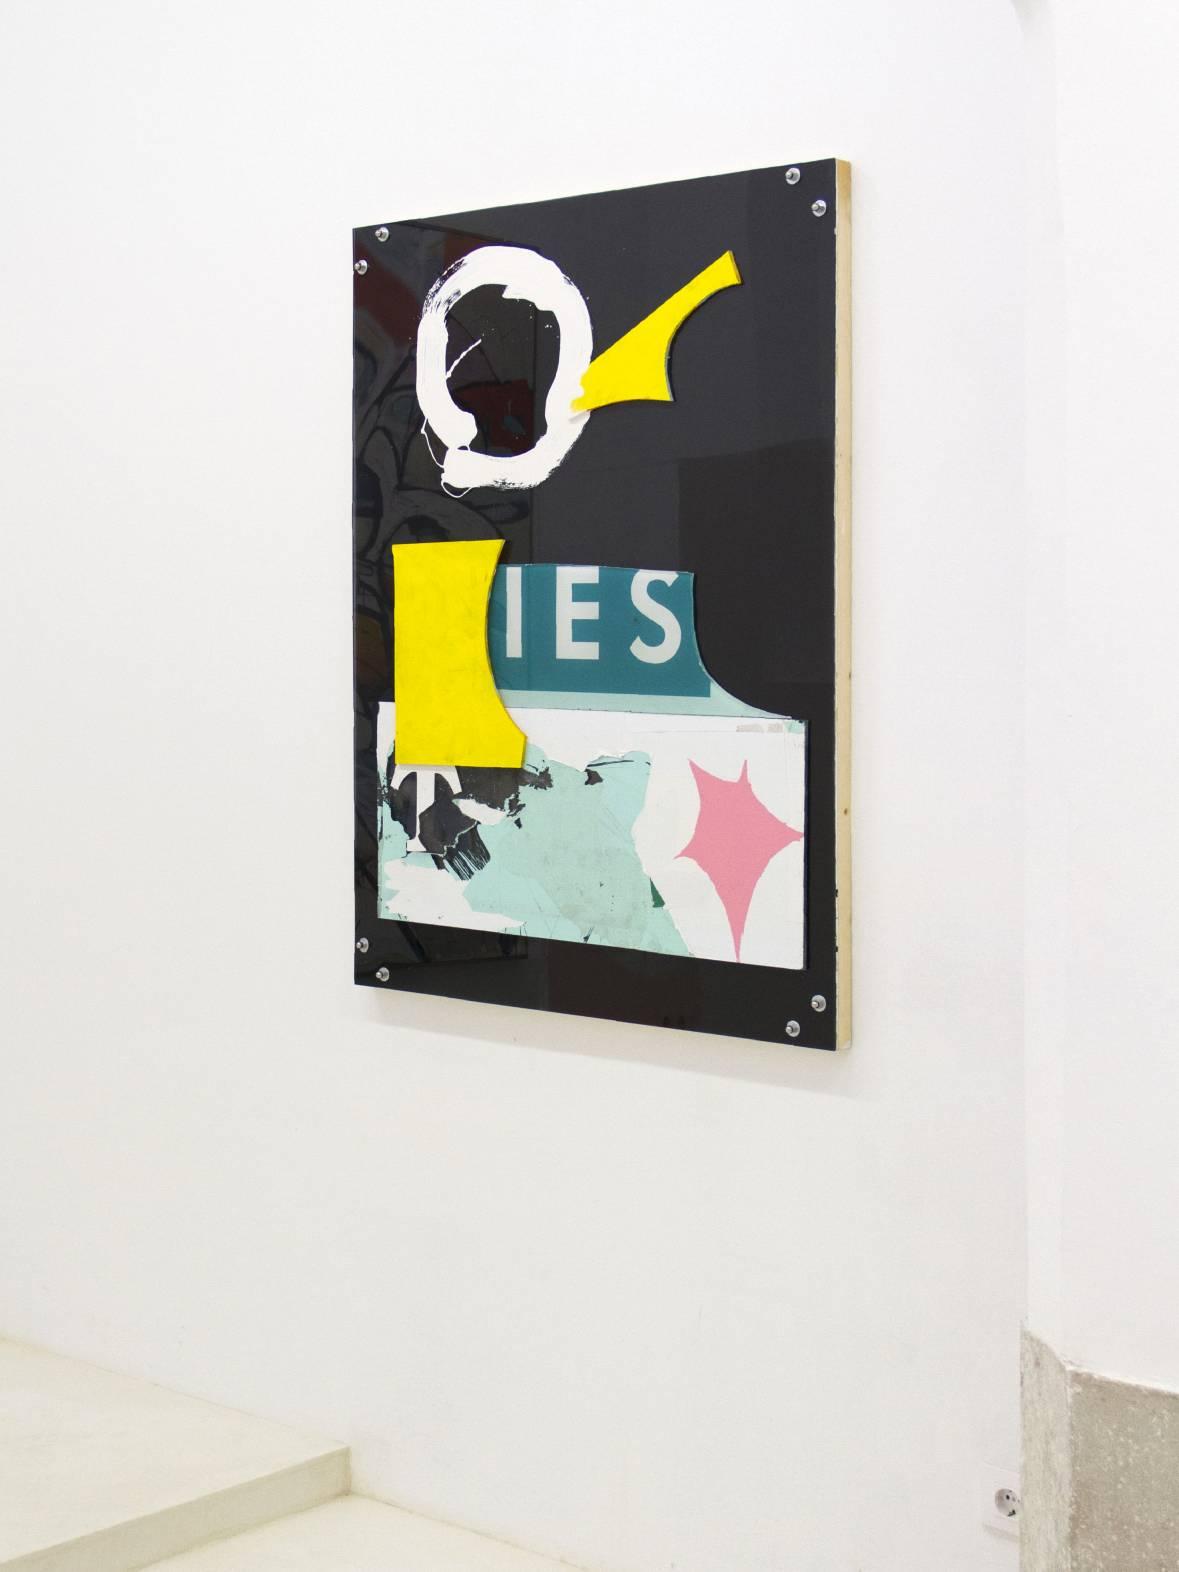 Lies (2017) - Xavi Ceerre